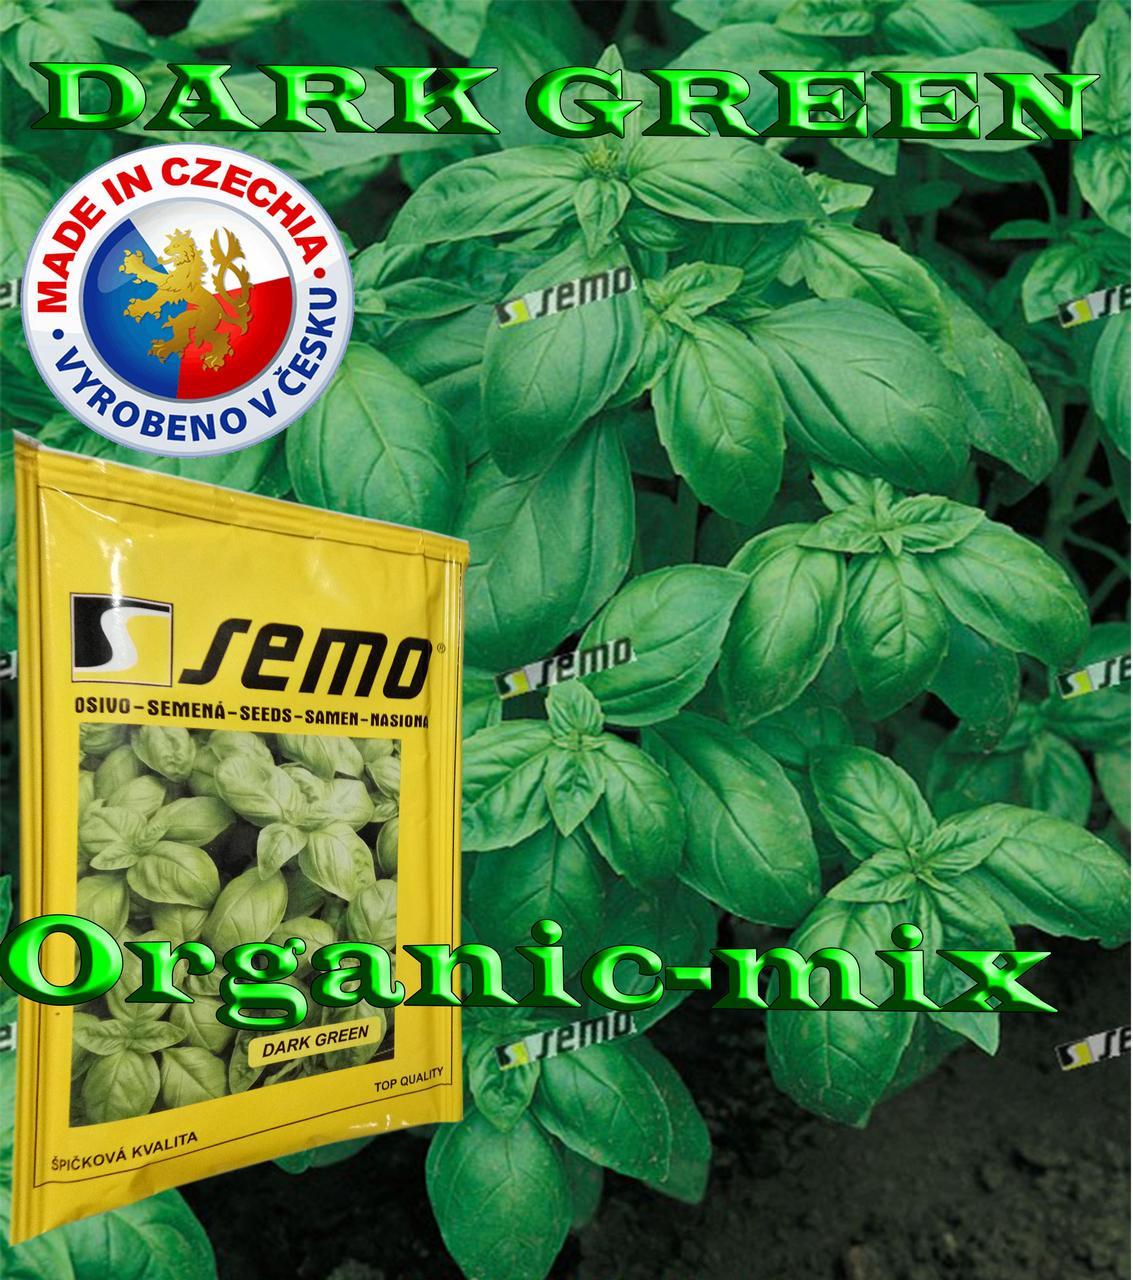 Базилик зеленый ДАРК ГРИН / DARK GREEN (проф.пакет 50 грамм) Semo (Чехия)